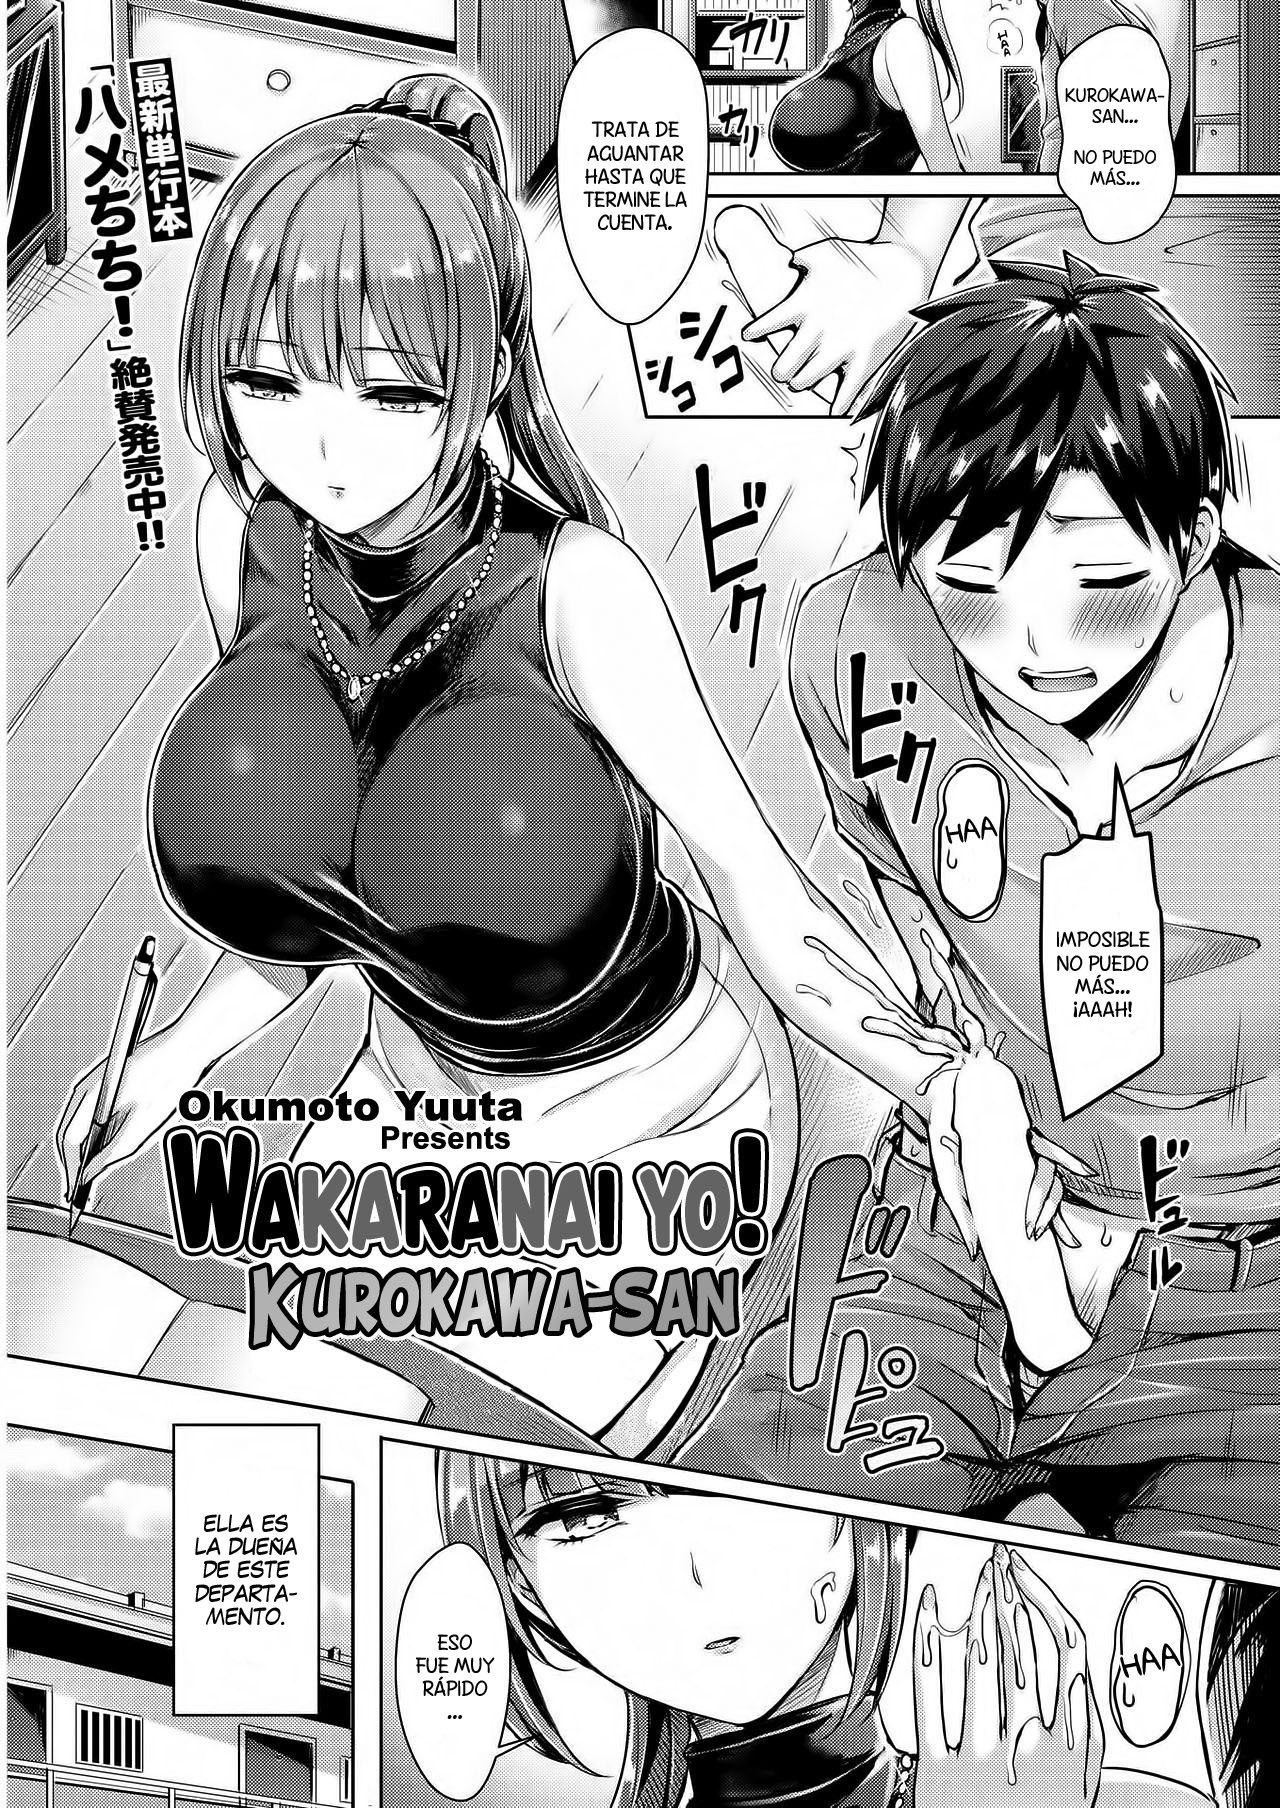 manga comic porno